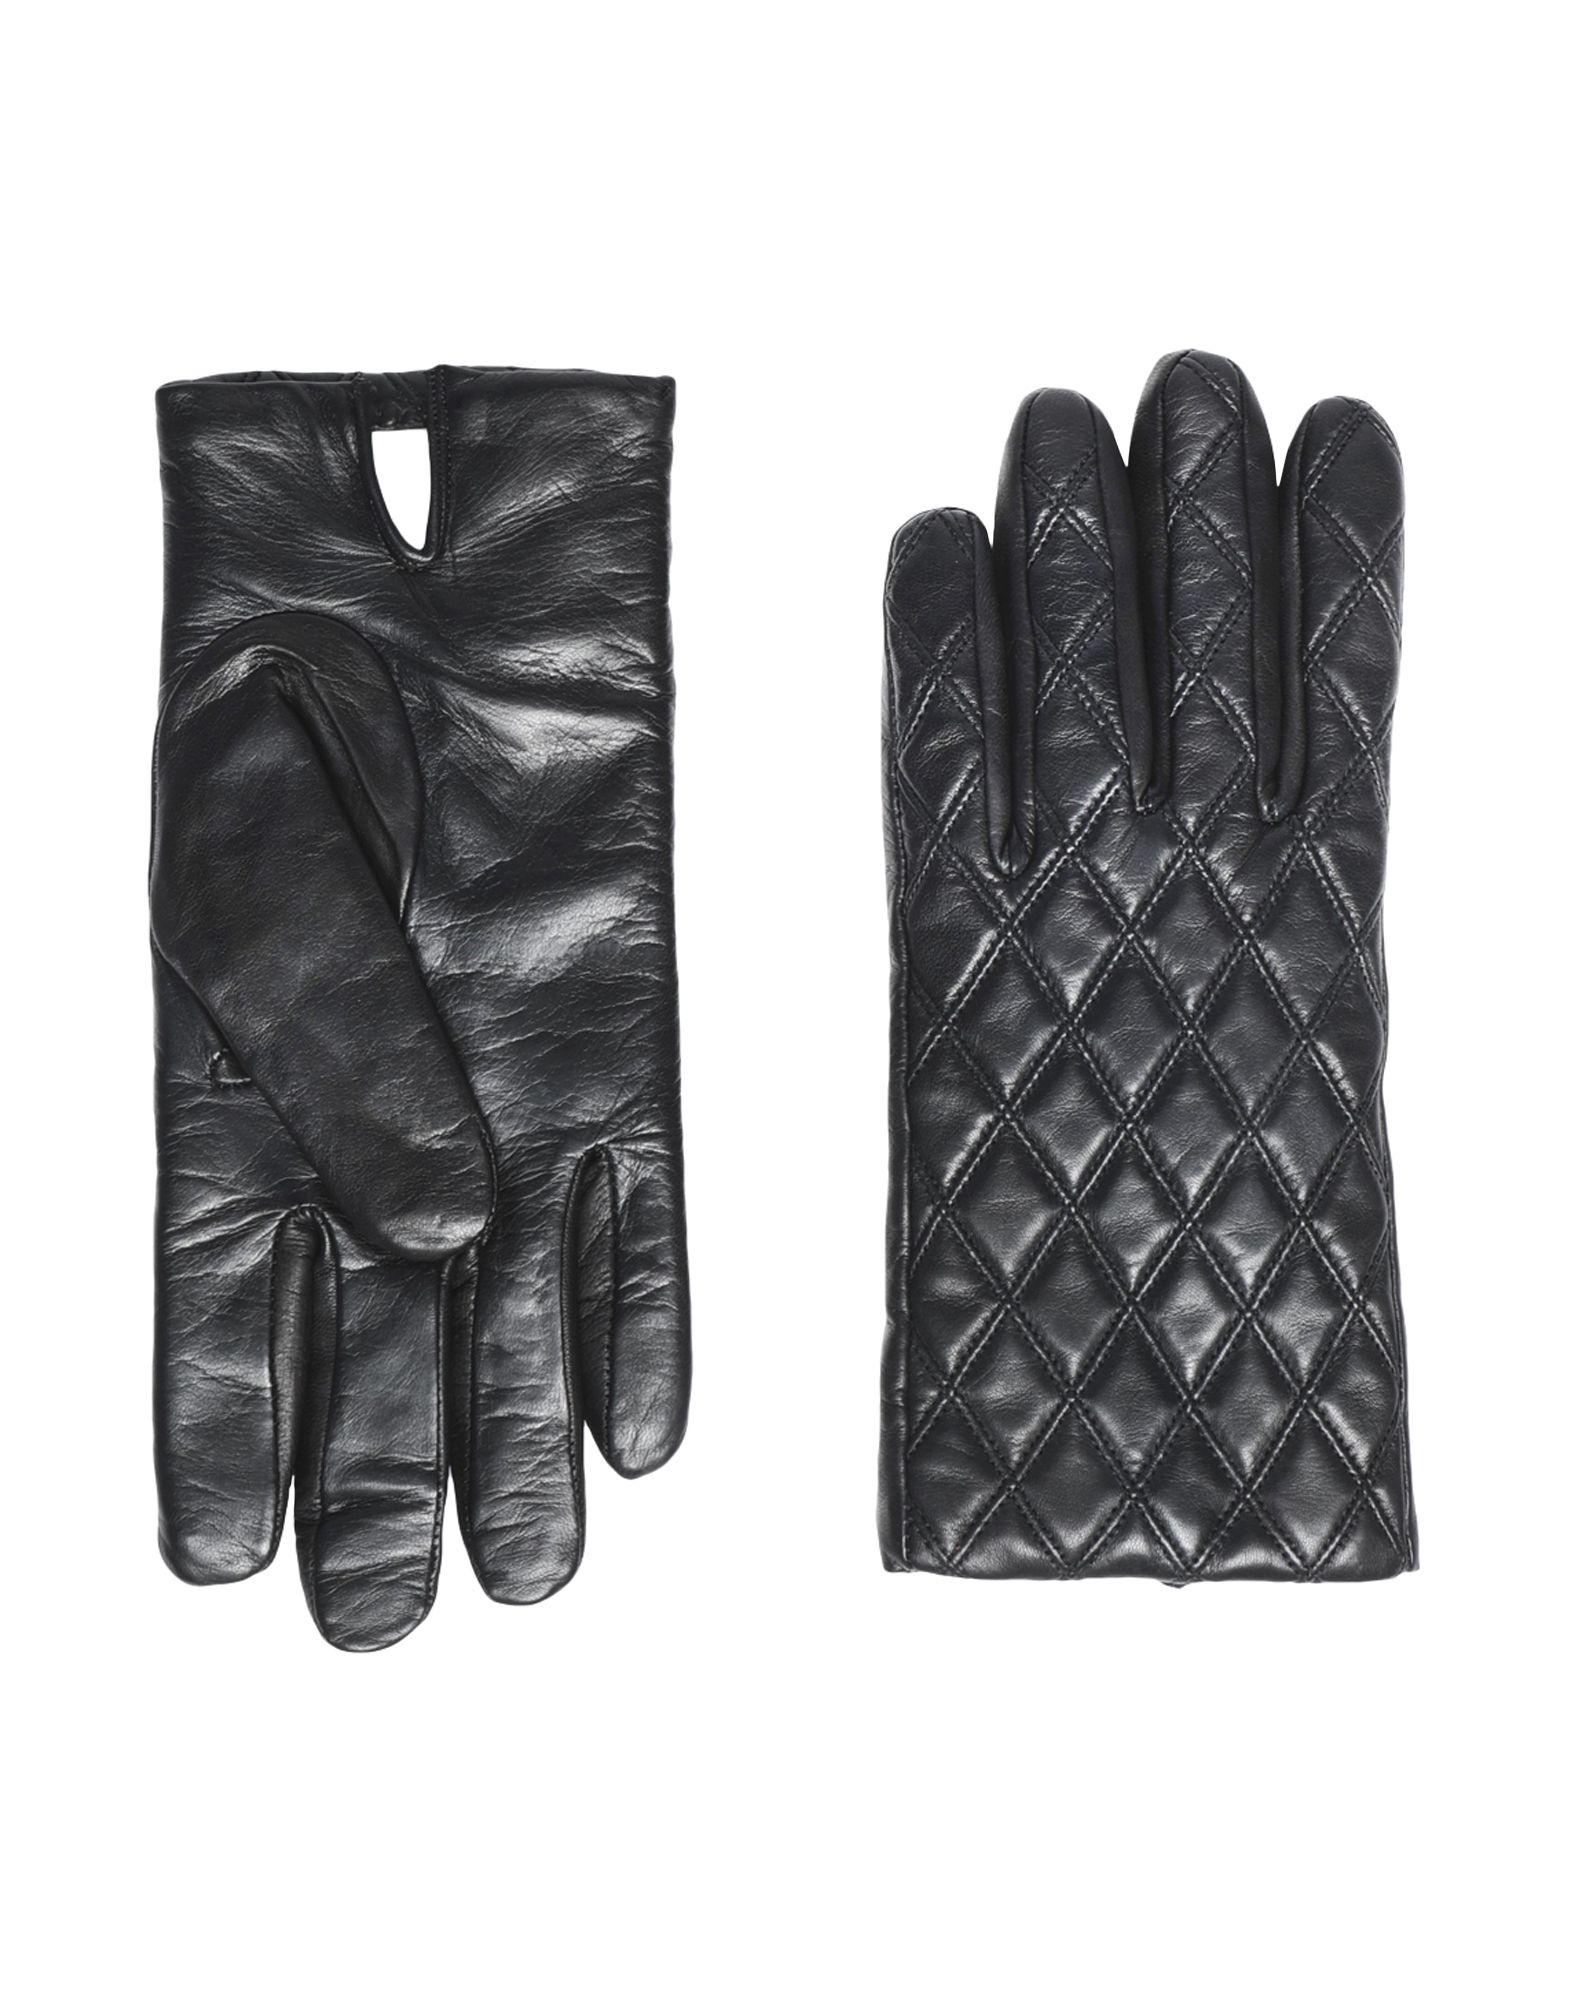 8 by YOOX Перчатки кожаные перчатки на меху